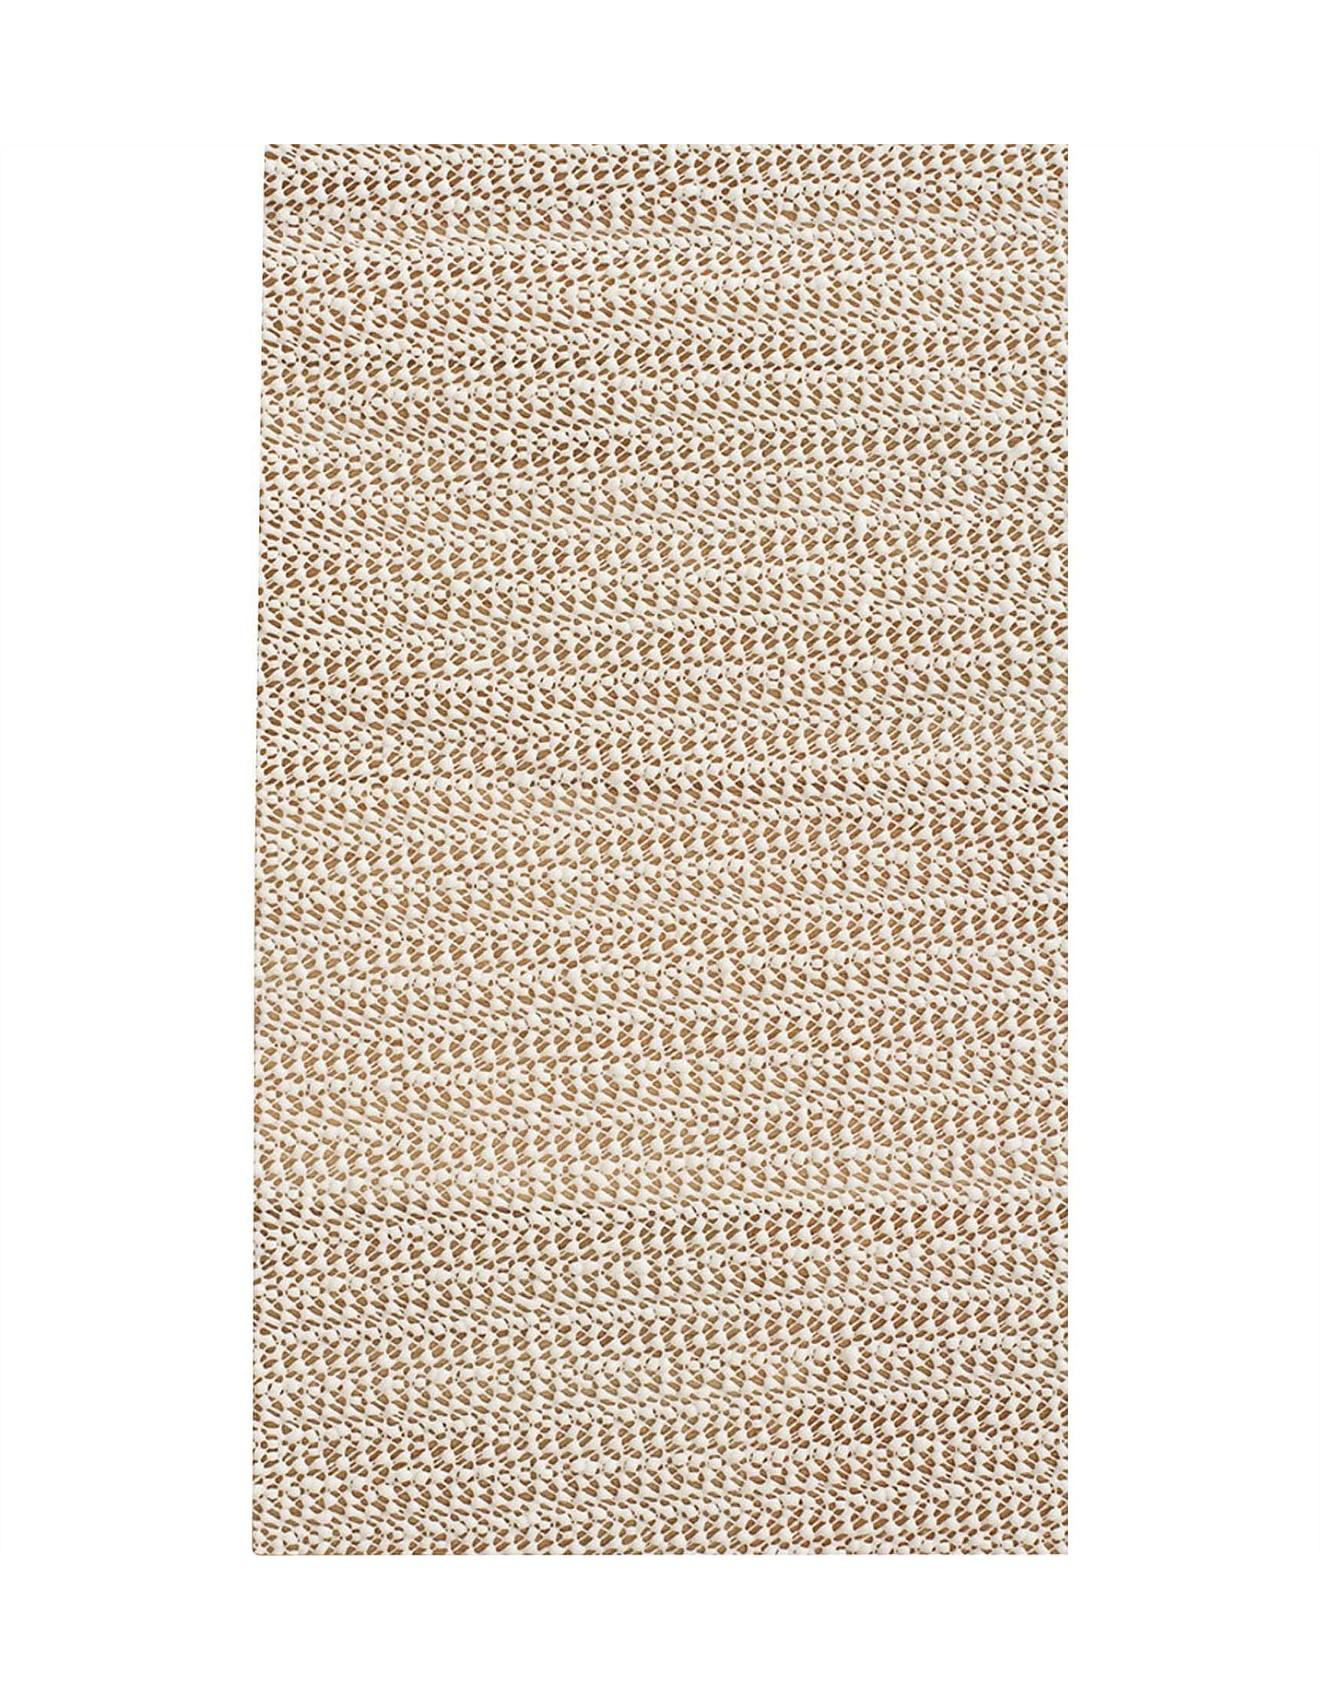 Total Grip Hard Floor Rug 270x180cm